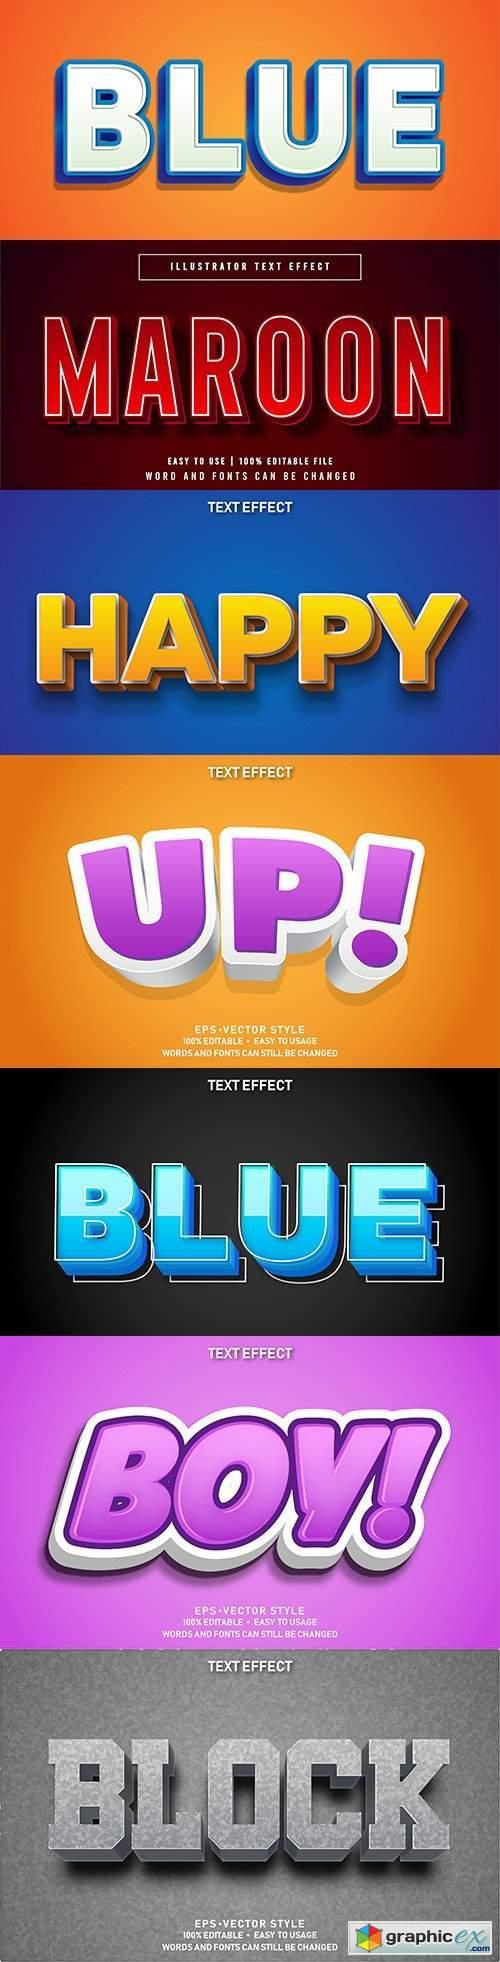 Editable font effect text collection illustration design 88